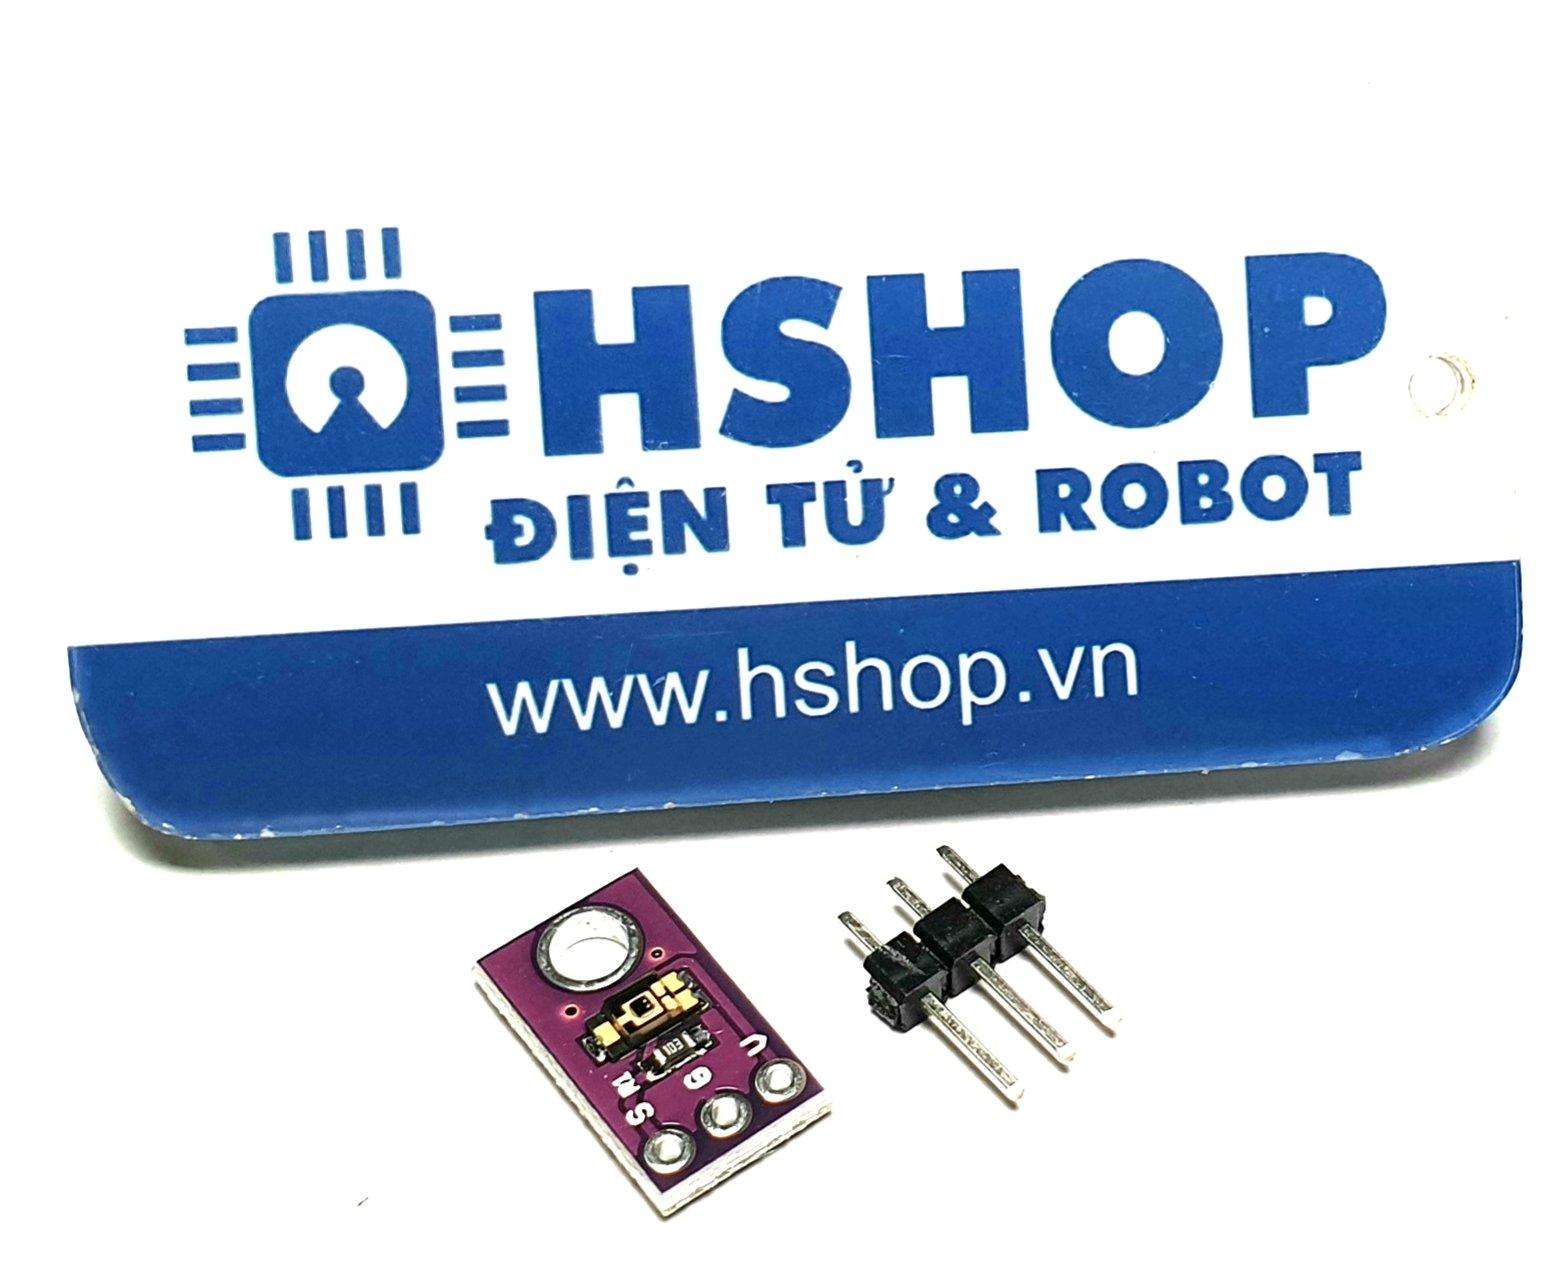 Cảm biến cường độ ánh sáng TEMT6000 Analog Light Sensor